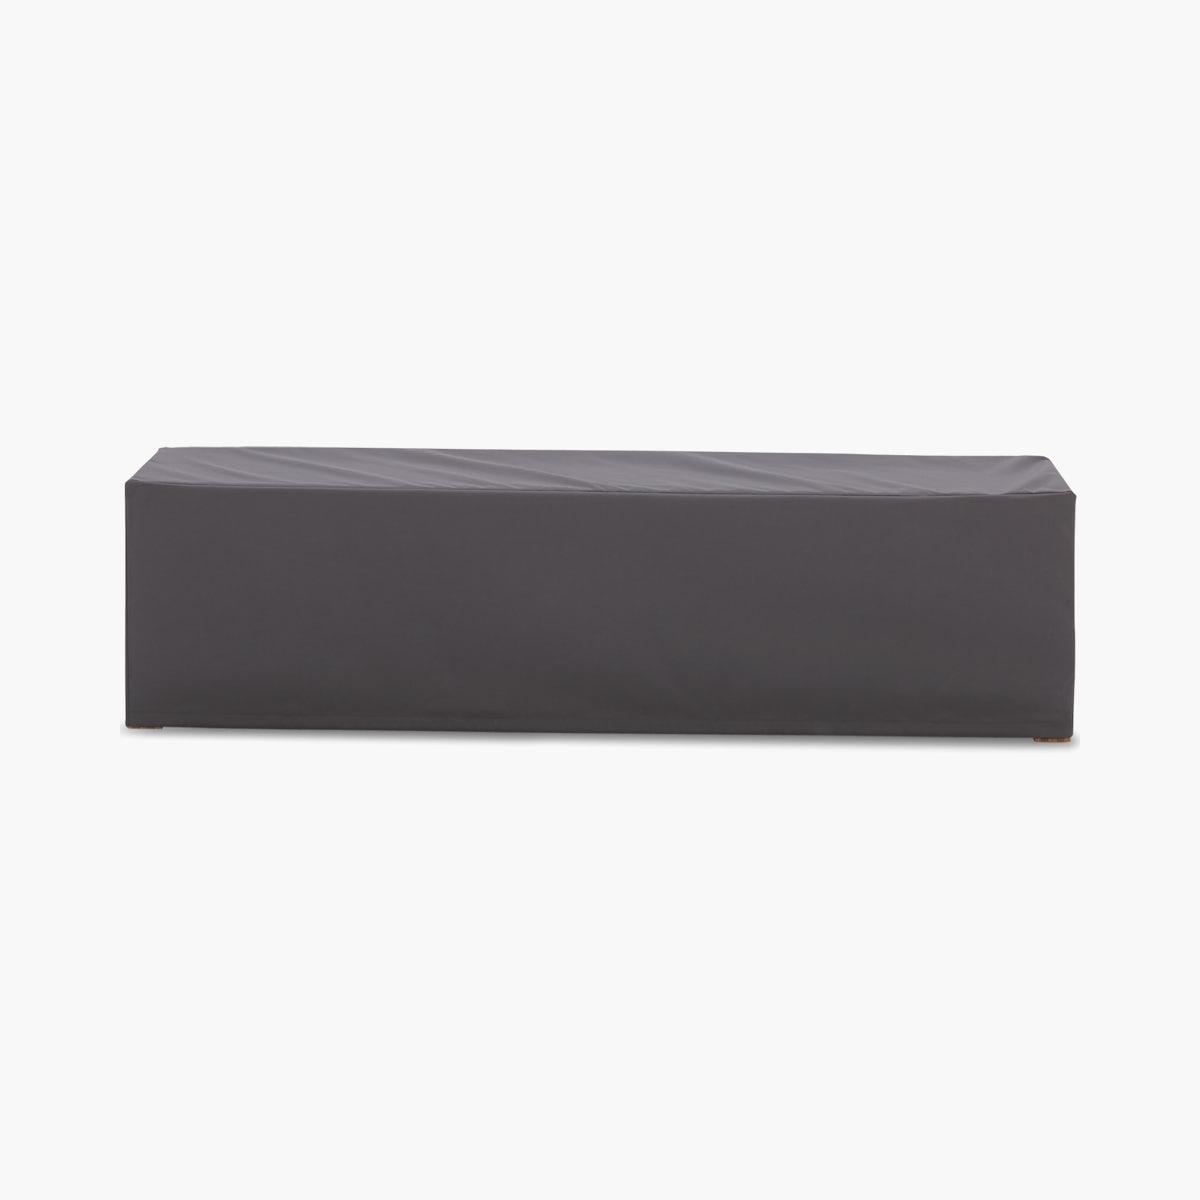 Block Island Bench Cover